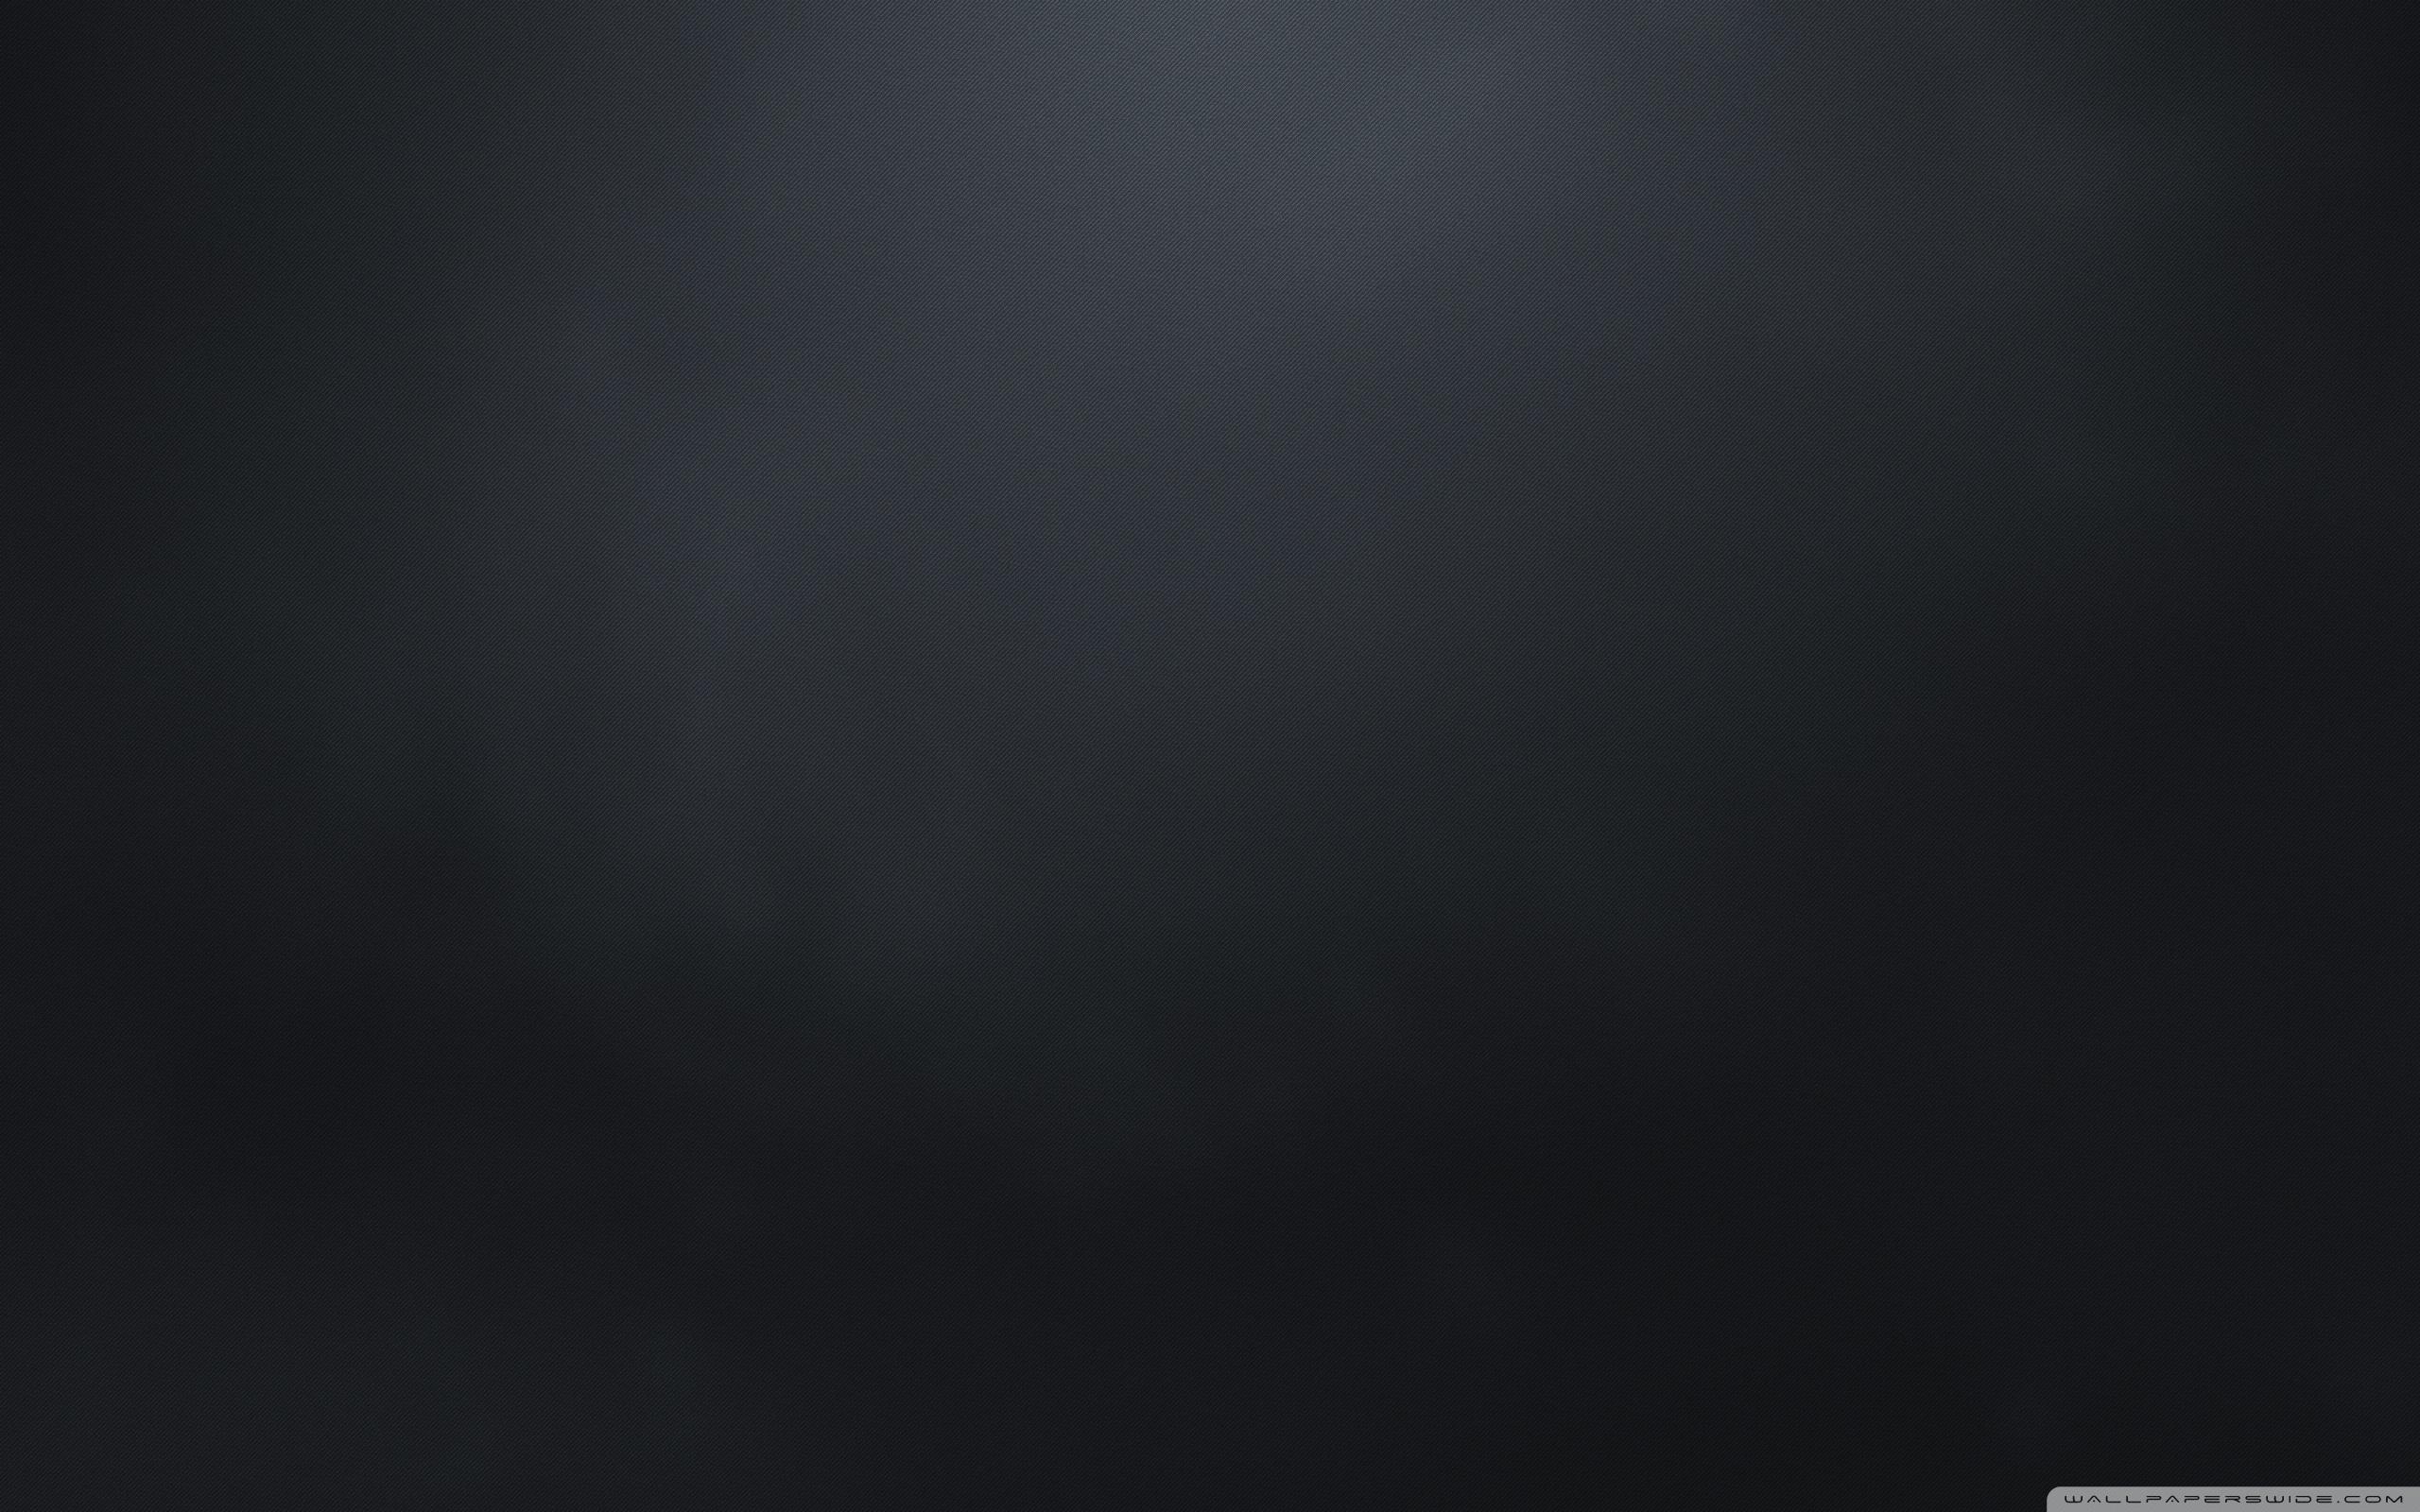 Dark Background ❤ 4K HD Desktop Wallpaper for 4K Ultra HD TV • Dual ...